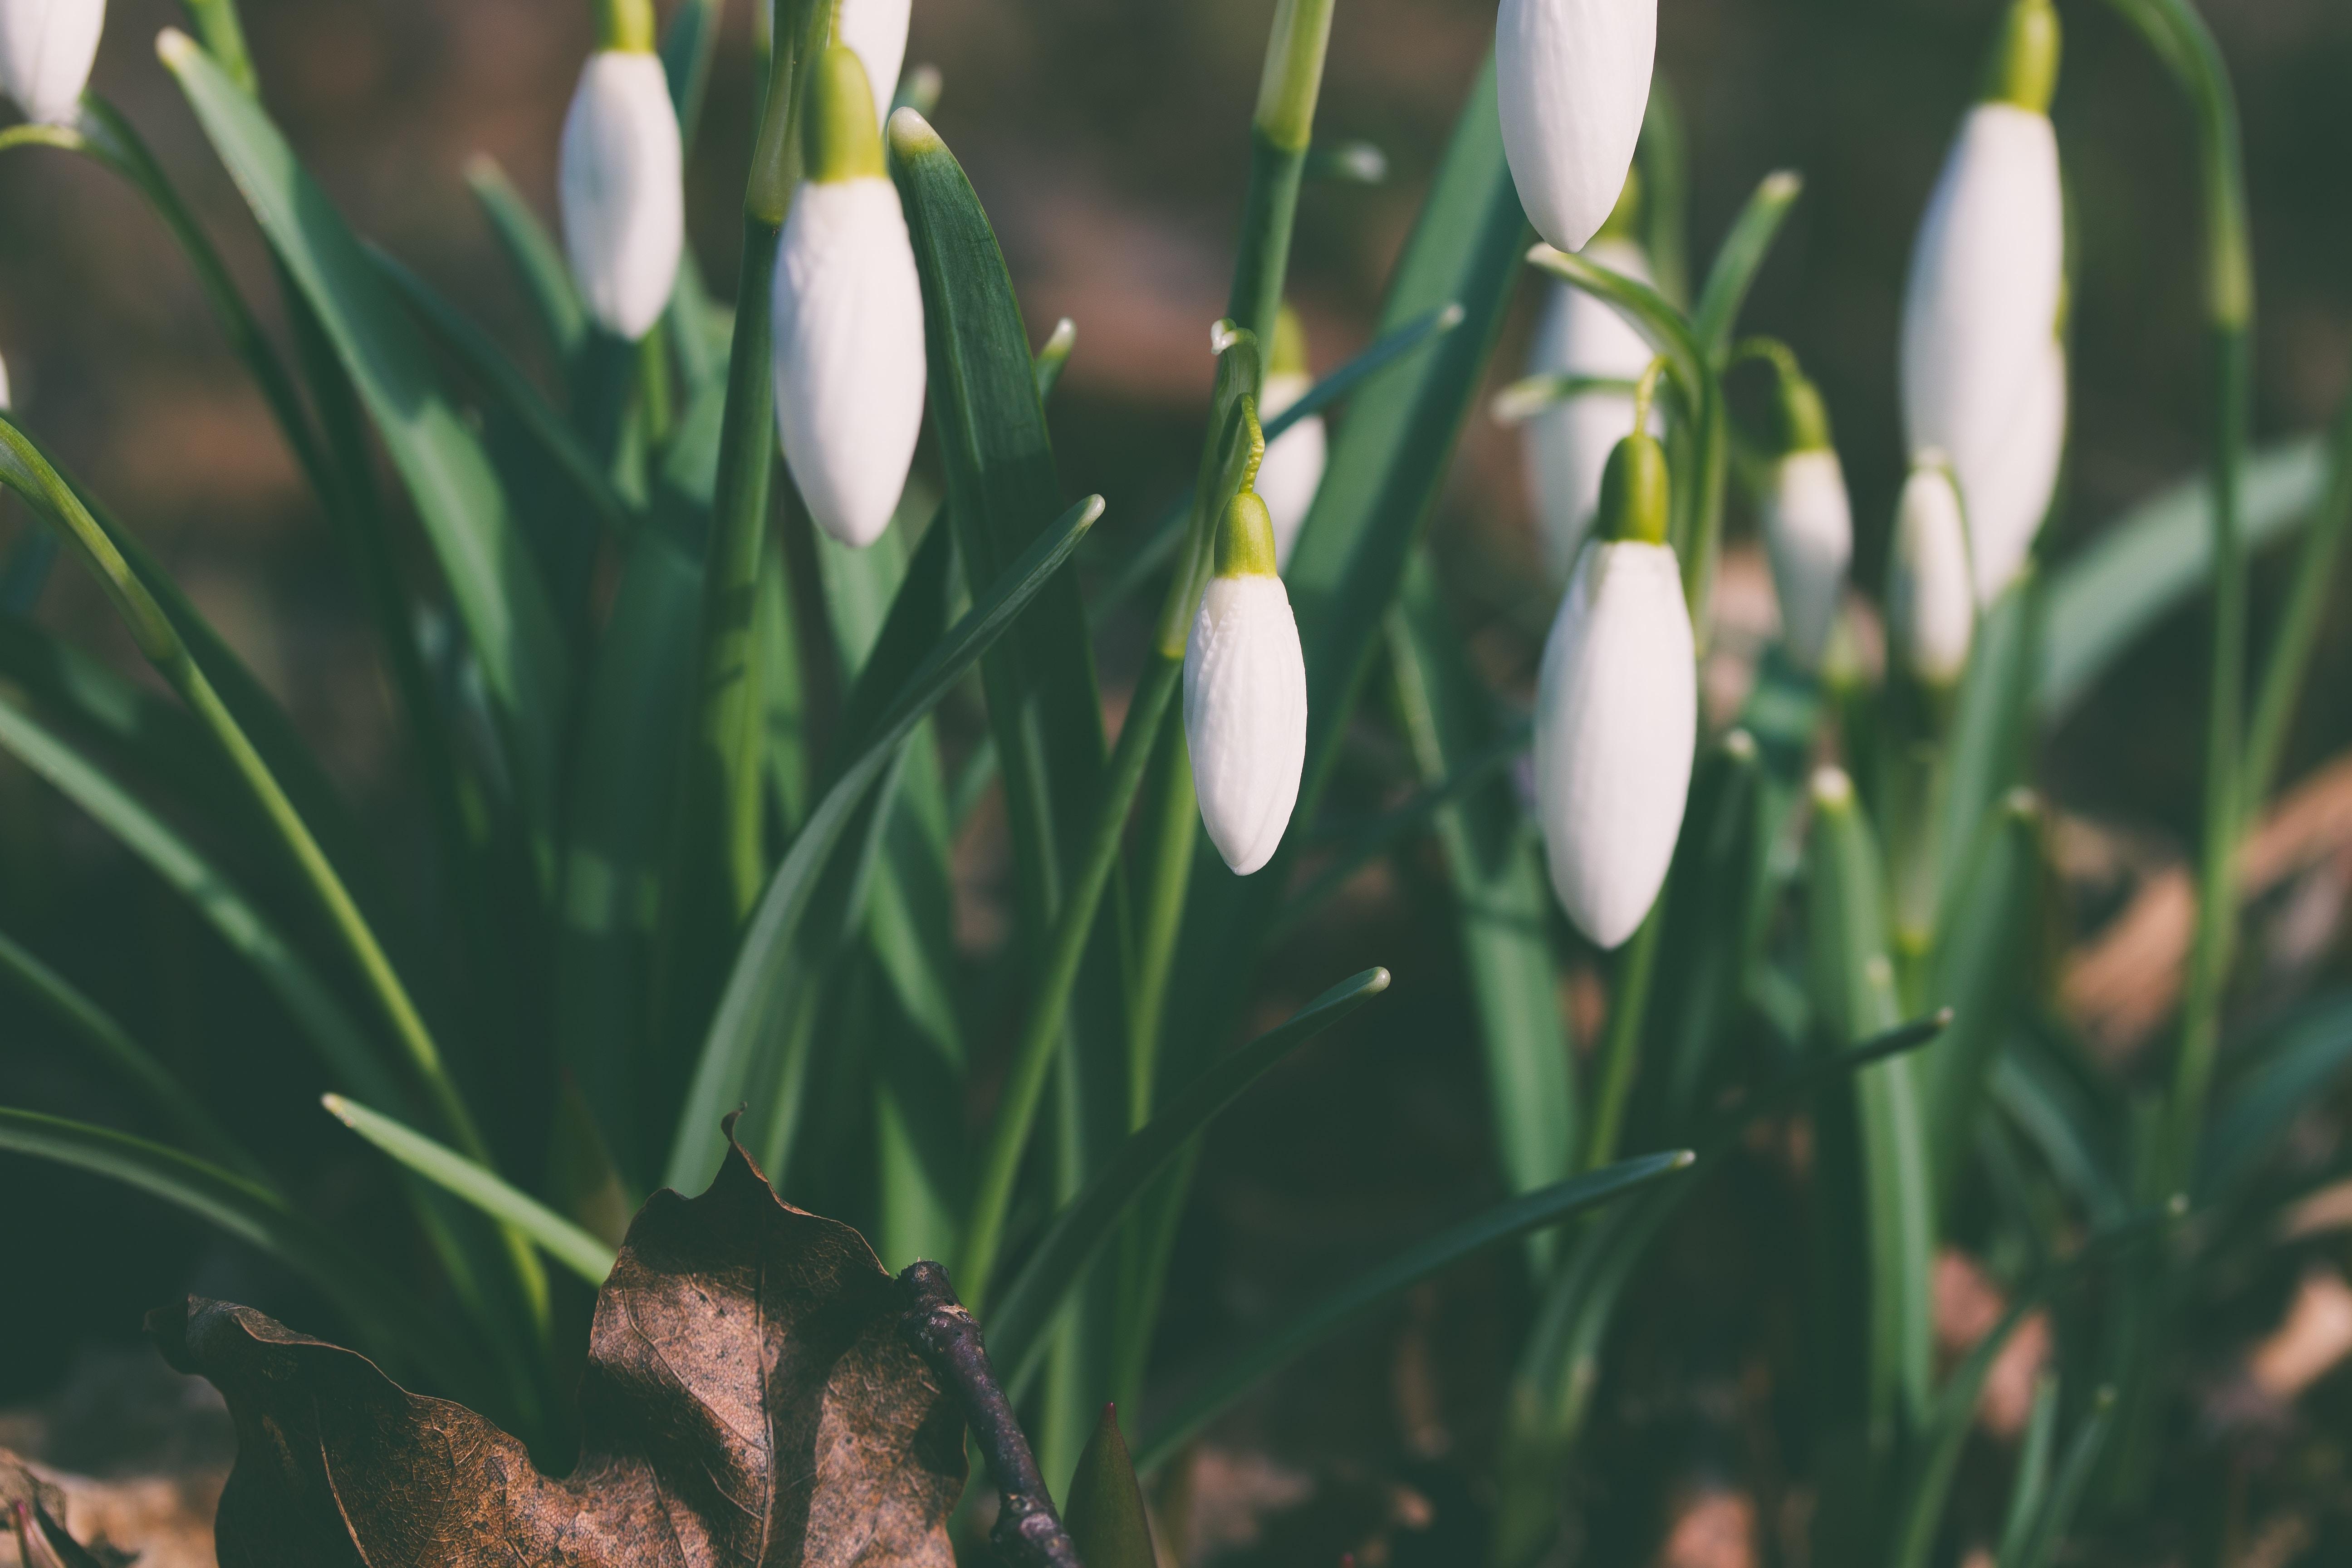 Close up white snowdrop flowers, petal and leaf in Spring, Pihtla Parish